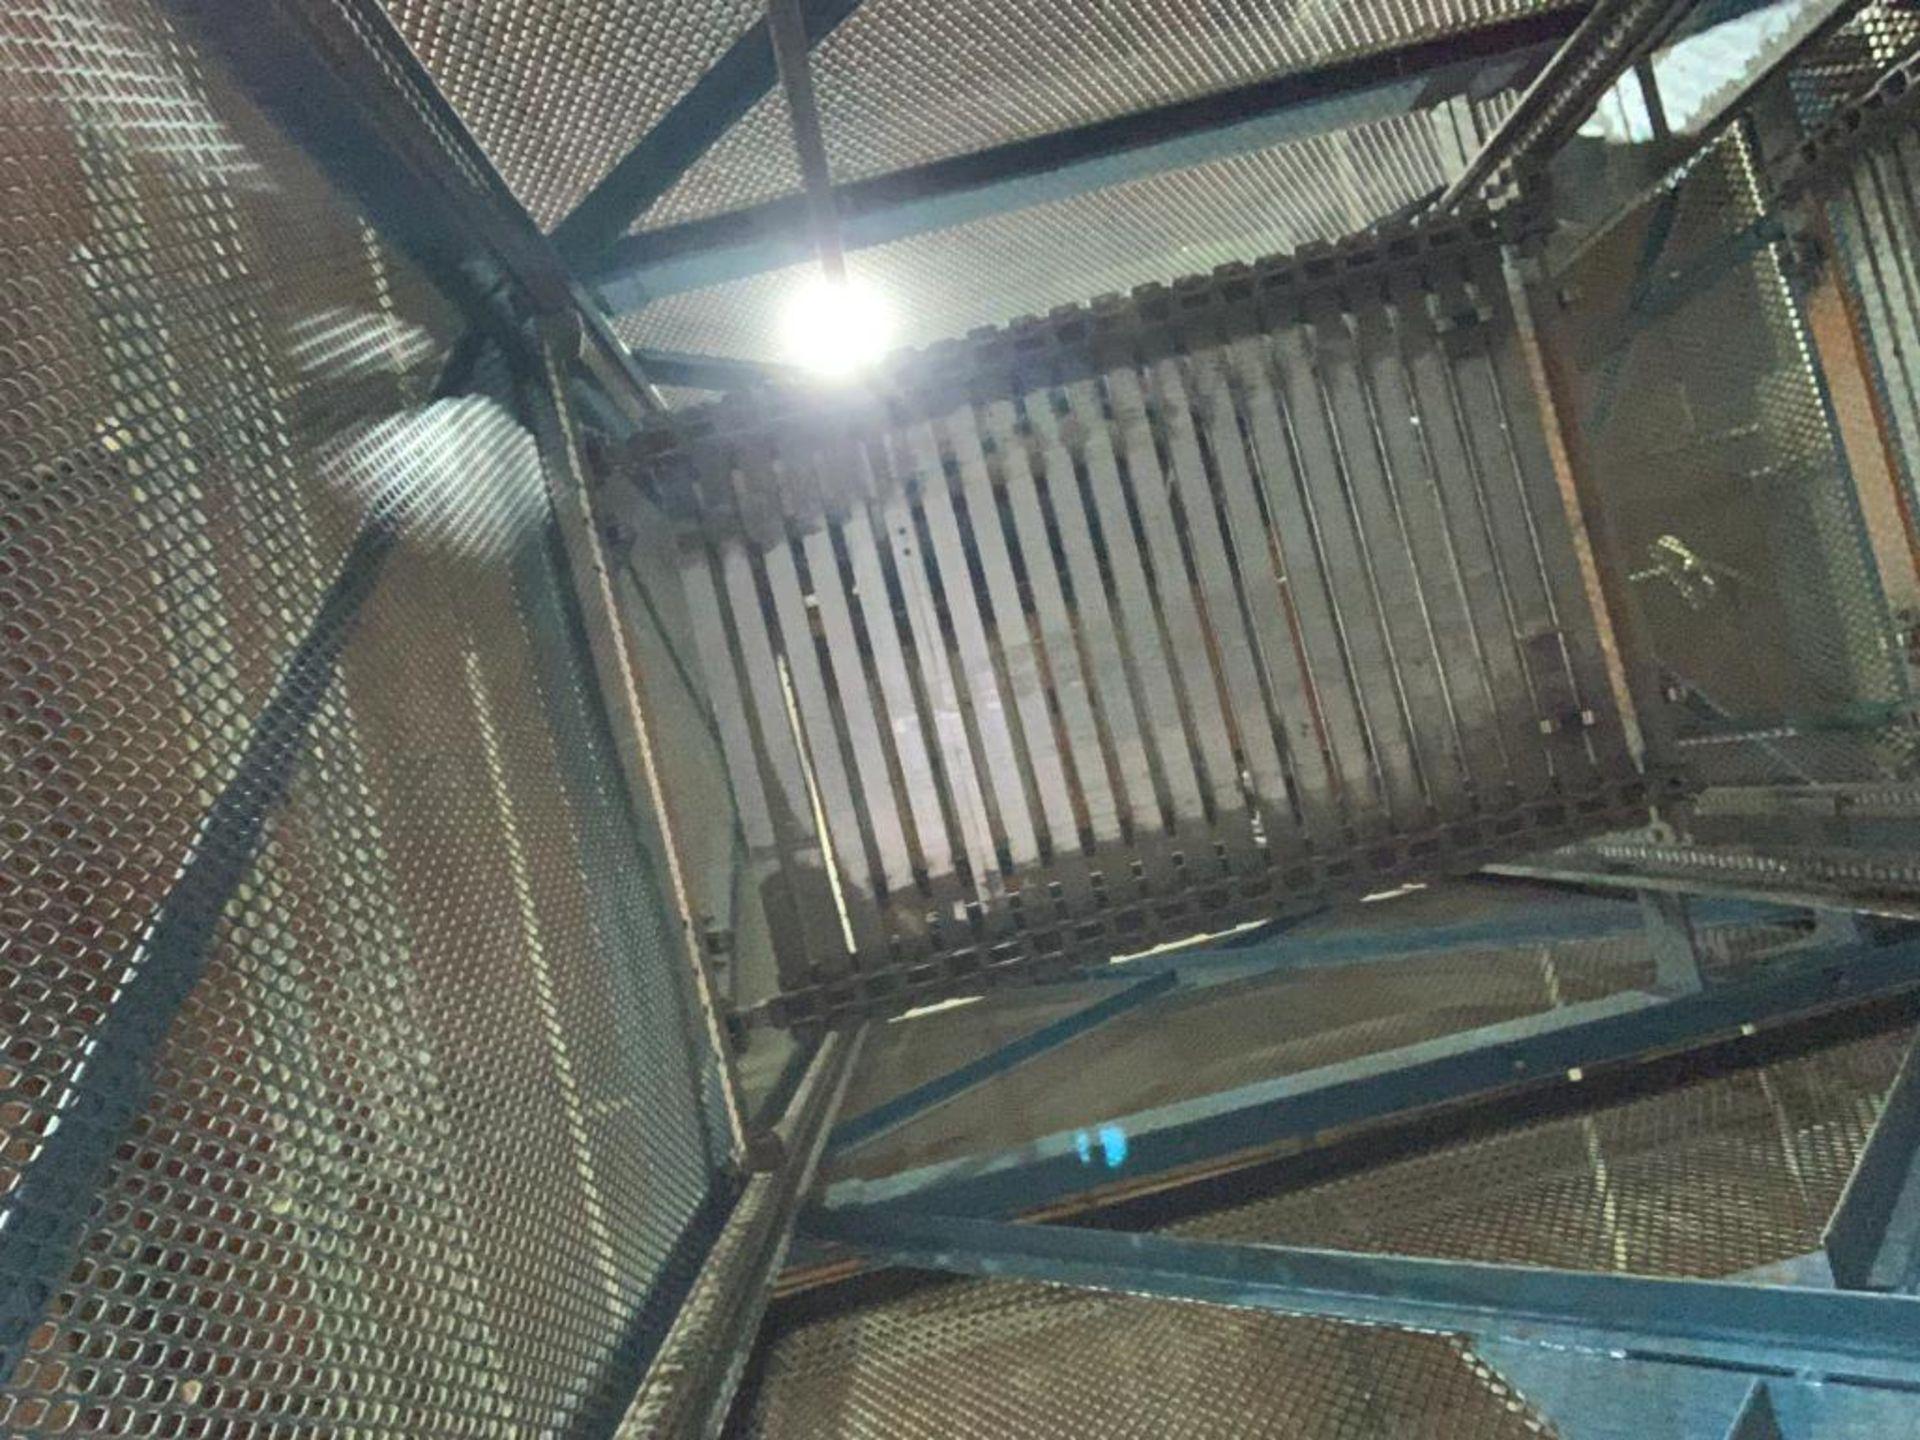 TKF vertical case elevator parts - Image 7 of 13